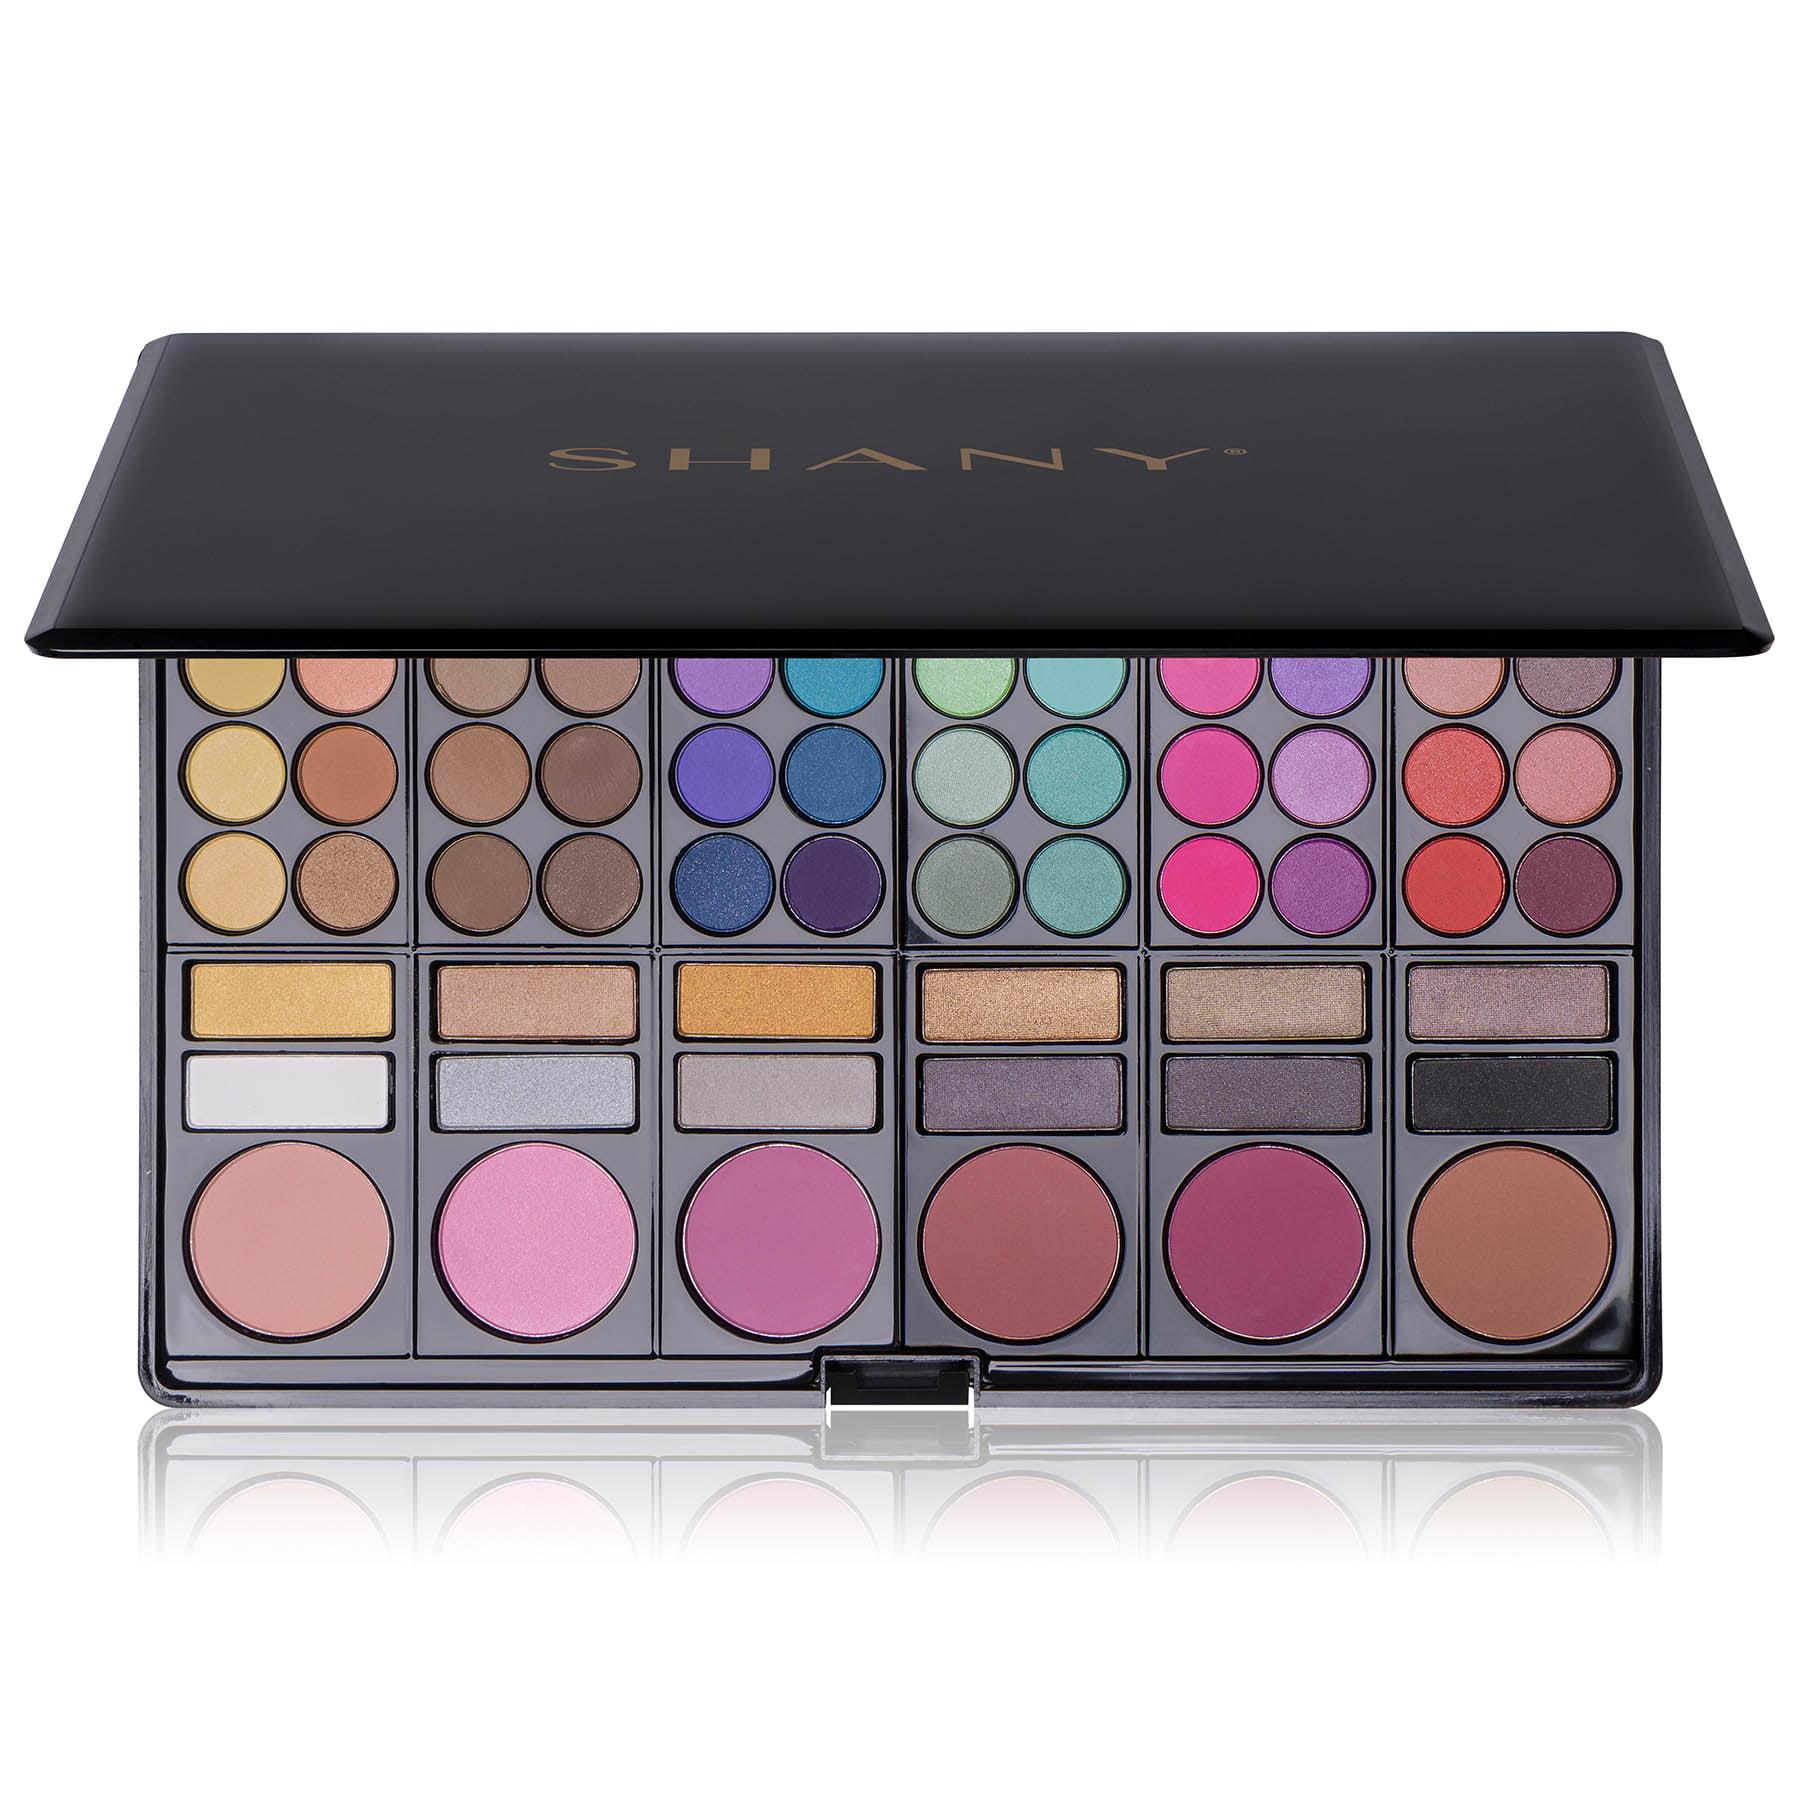 SHANY Professional Eye Shadow & Blush Palette, 15.4 oz